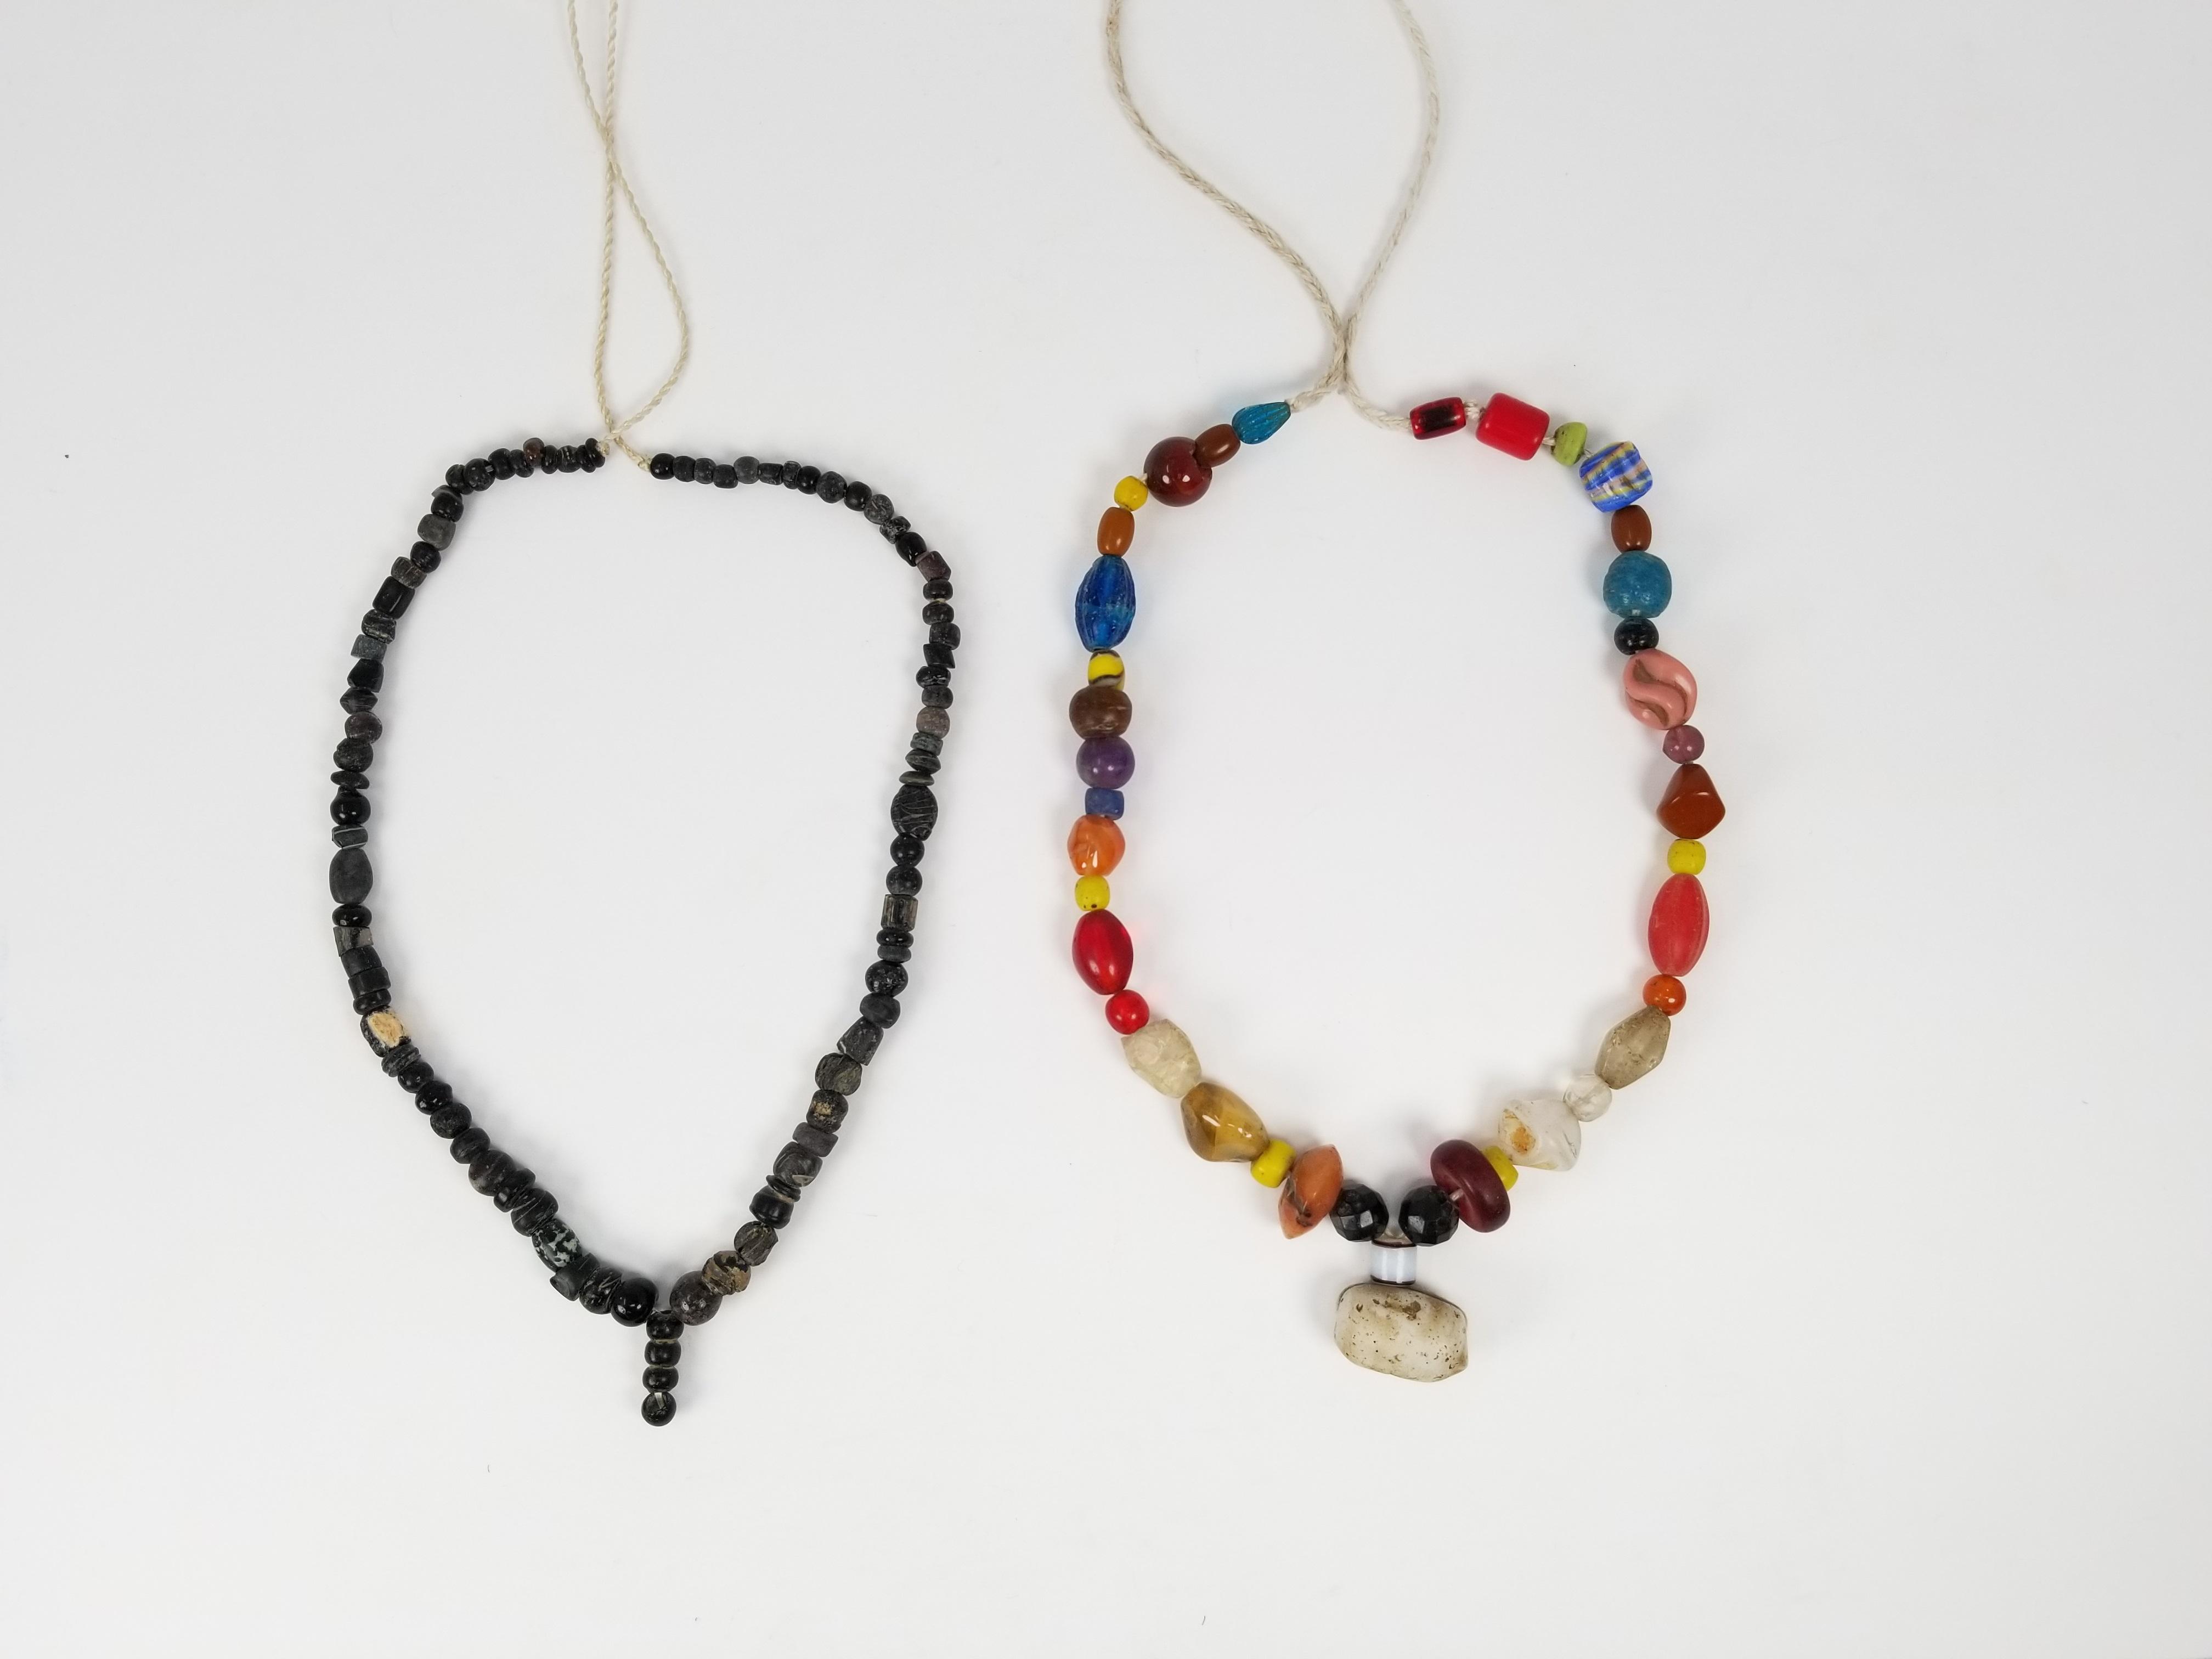 Lot 134c - (2) Assorted Ancient Roman, Indus Valley Necklaces